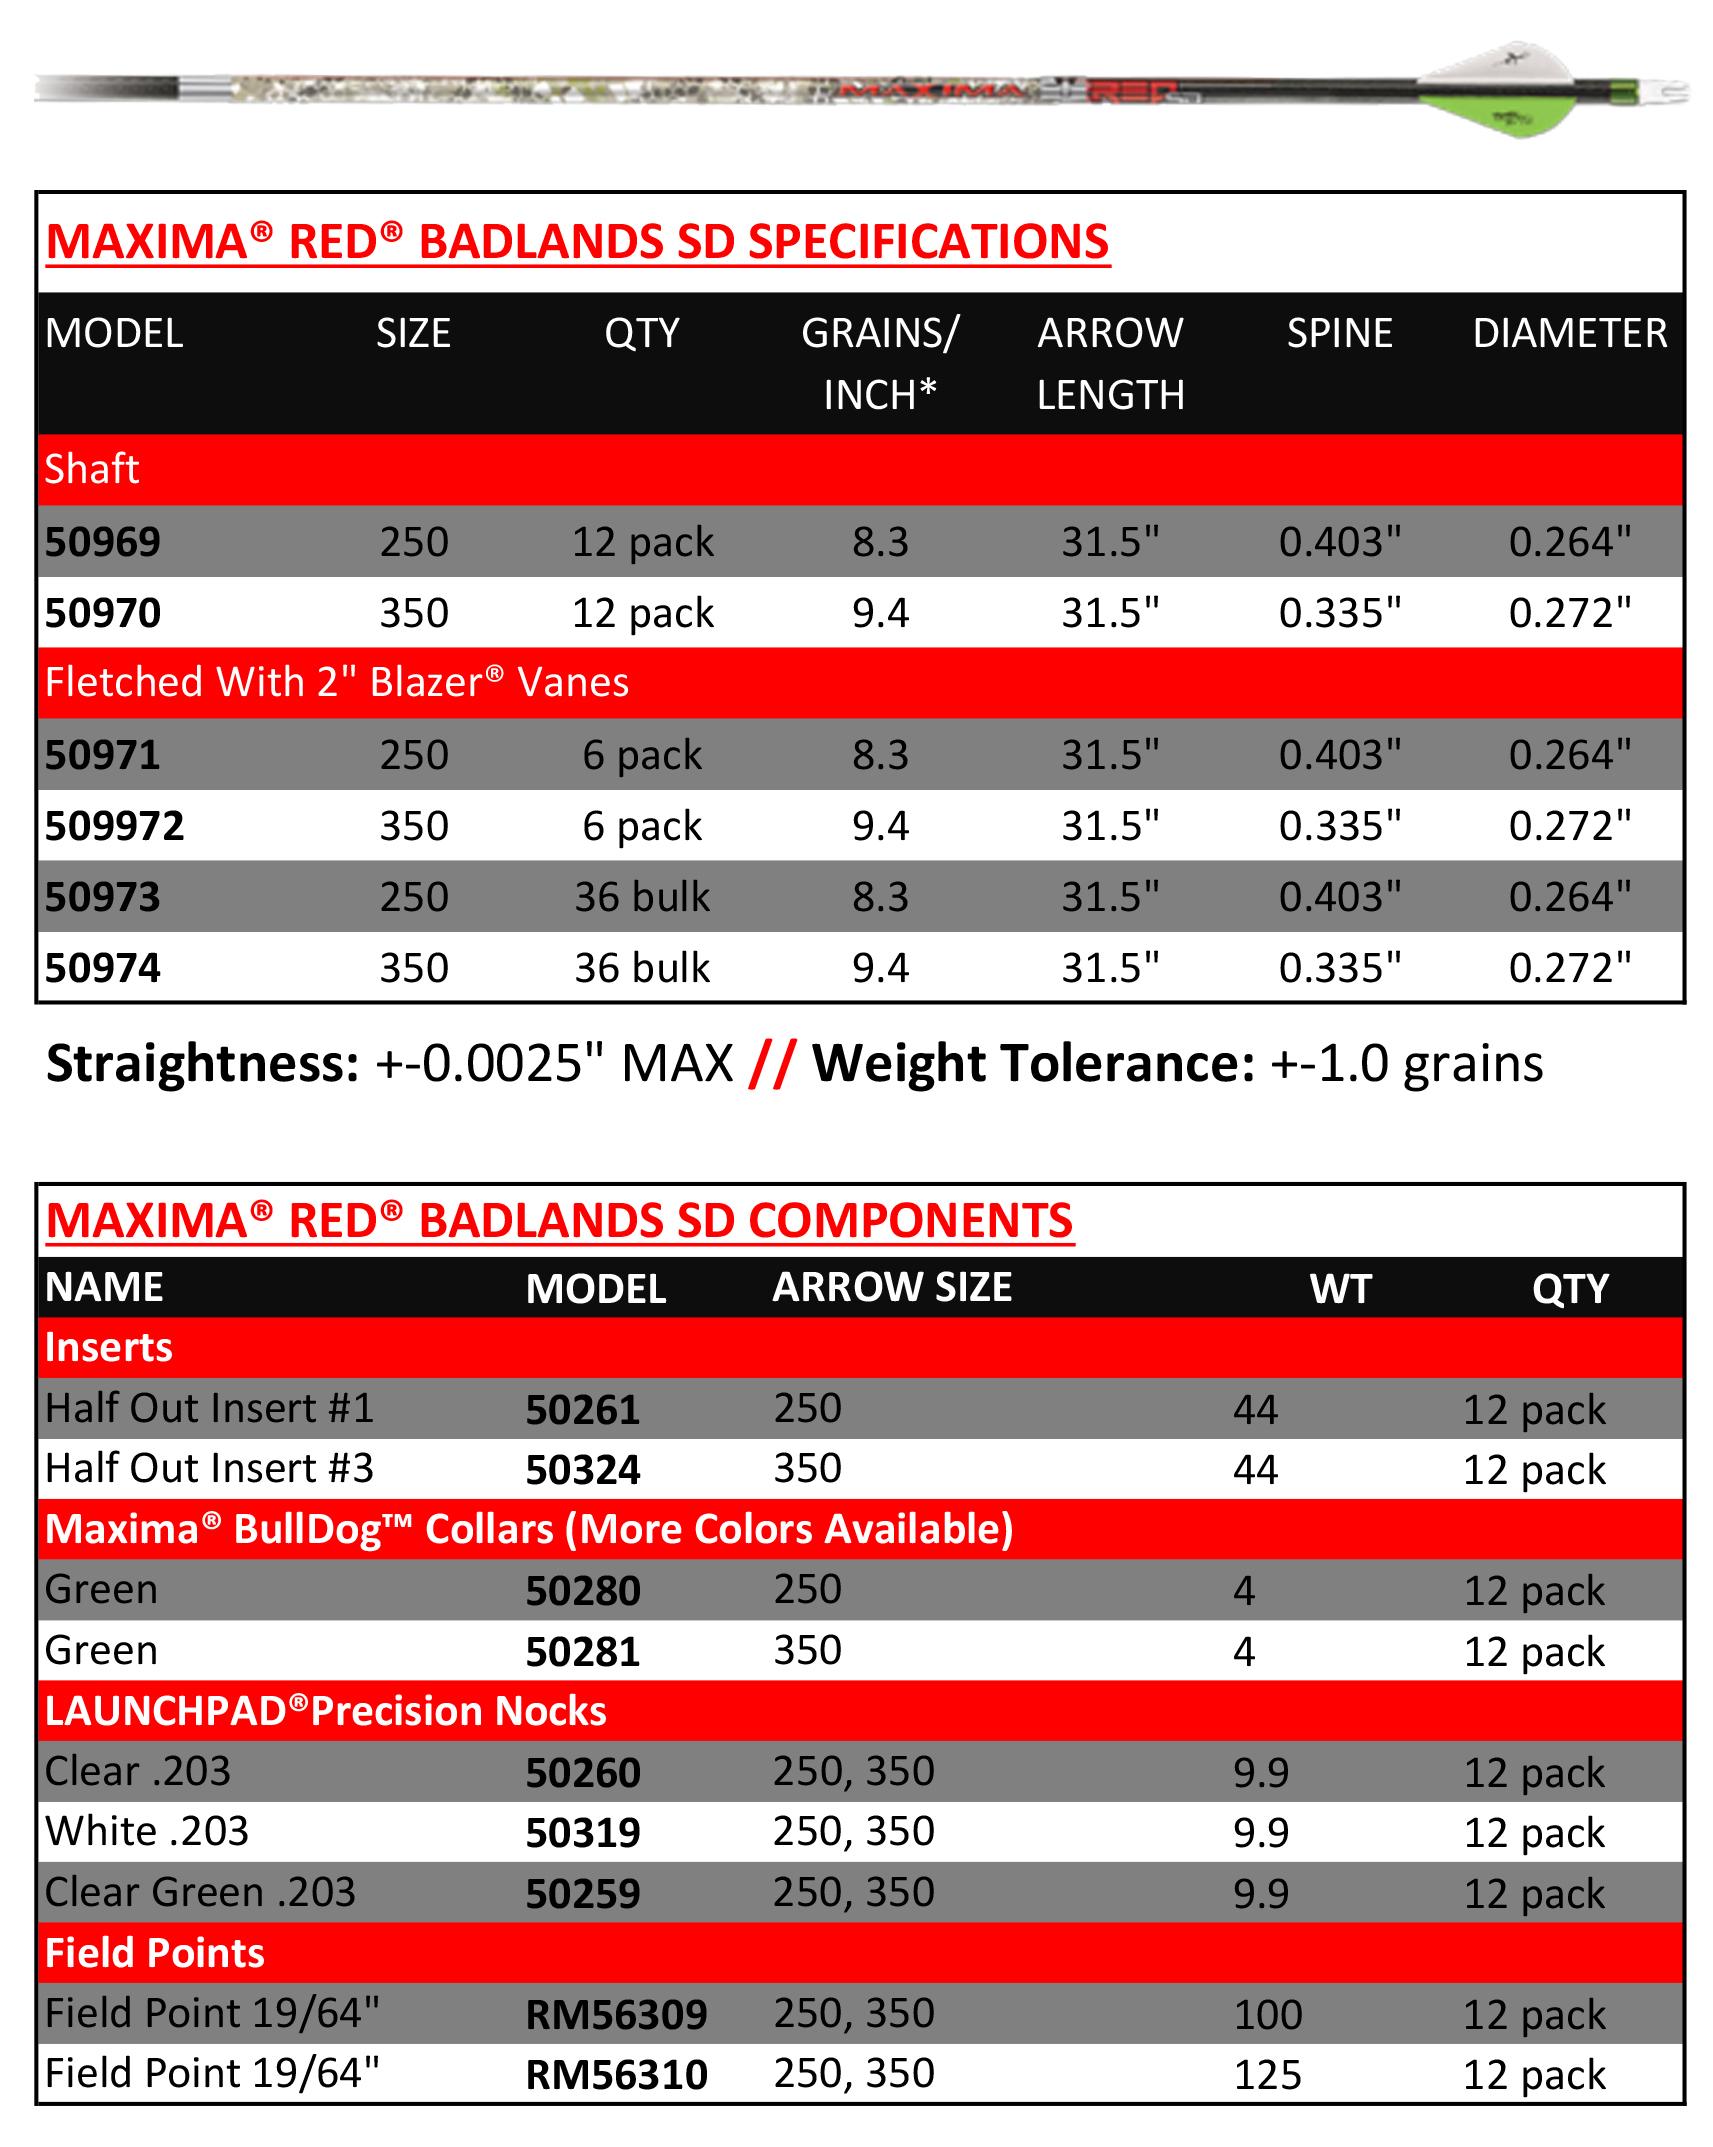 cx-maxima-red-badlands-sd-chart.jpg